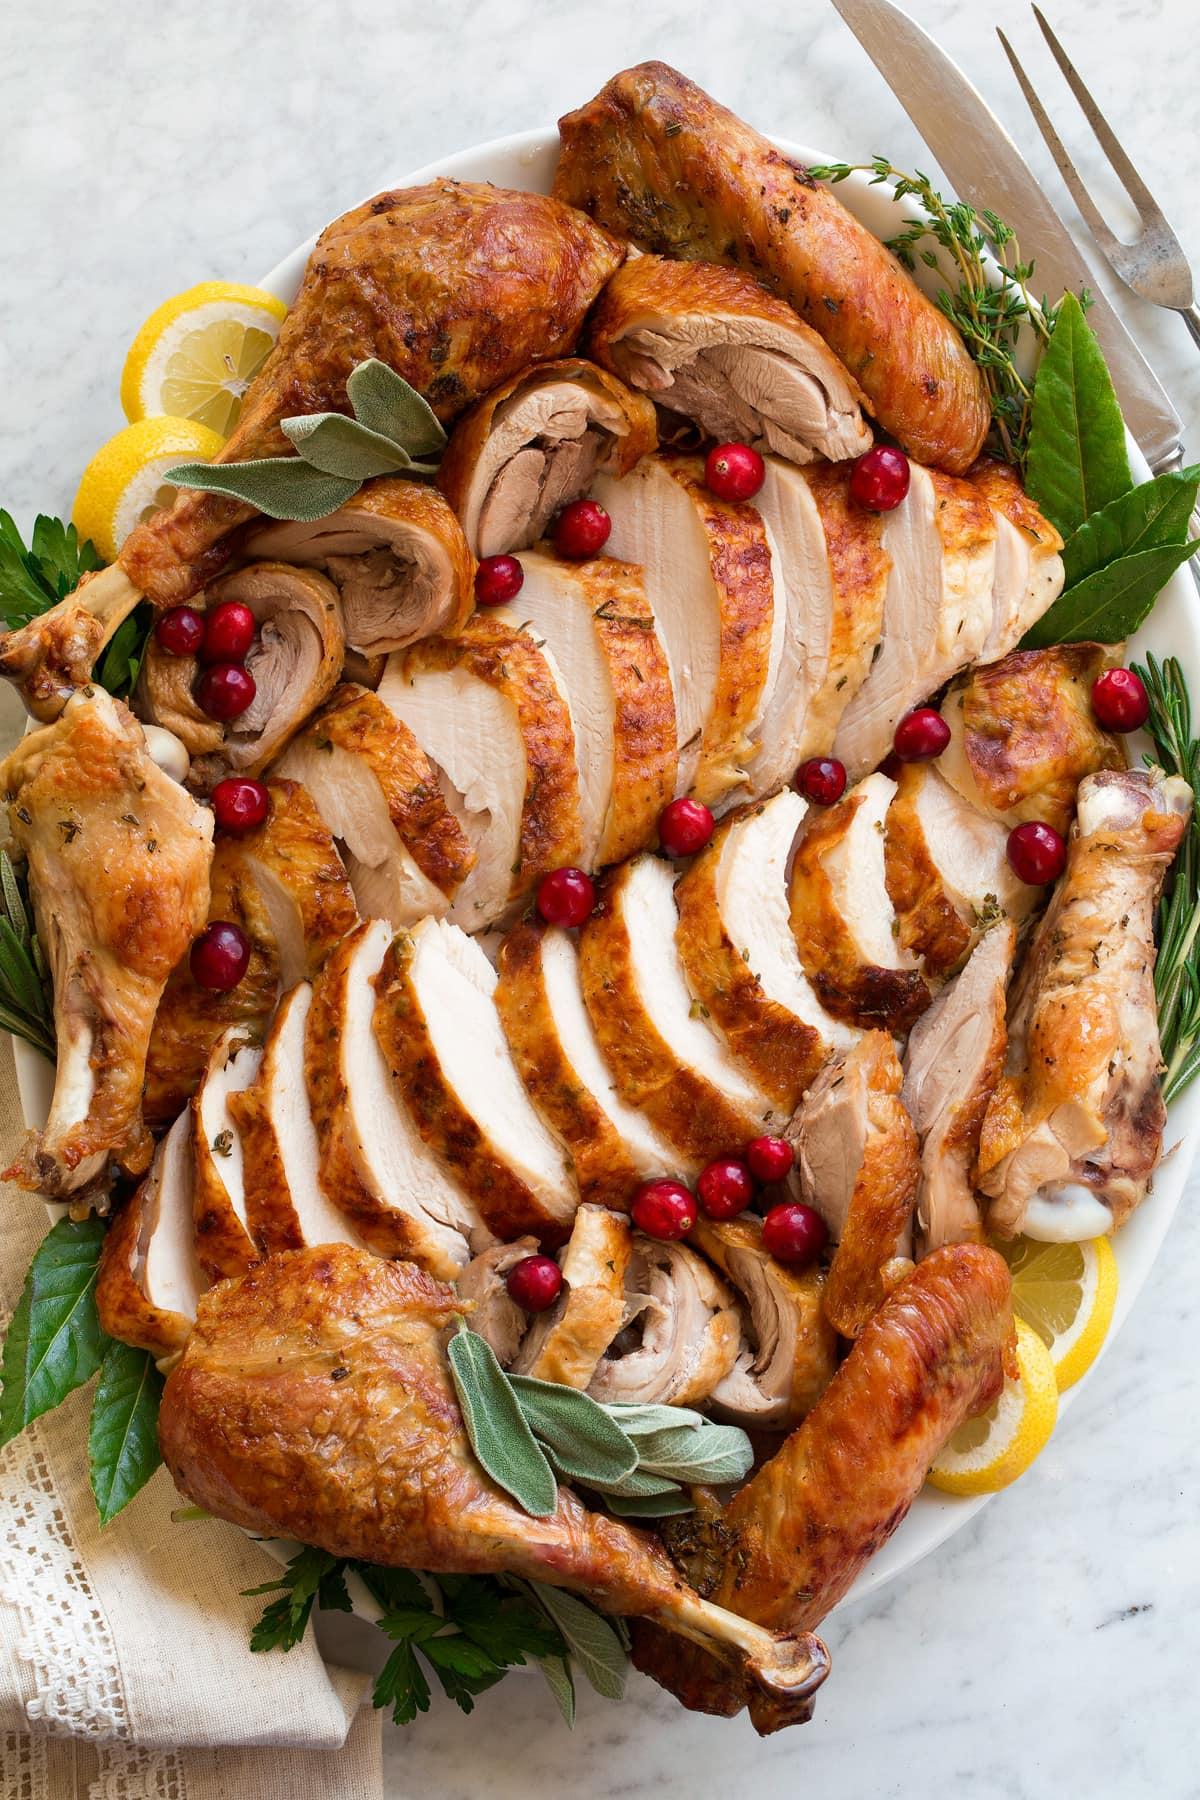 Carved turkey on a platter.